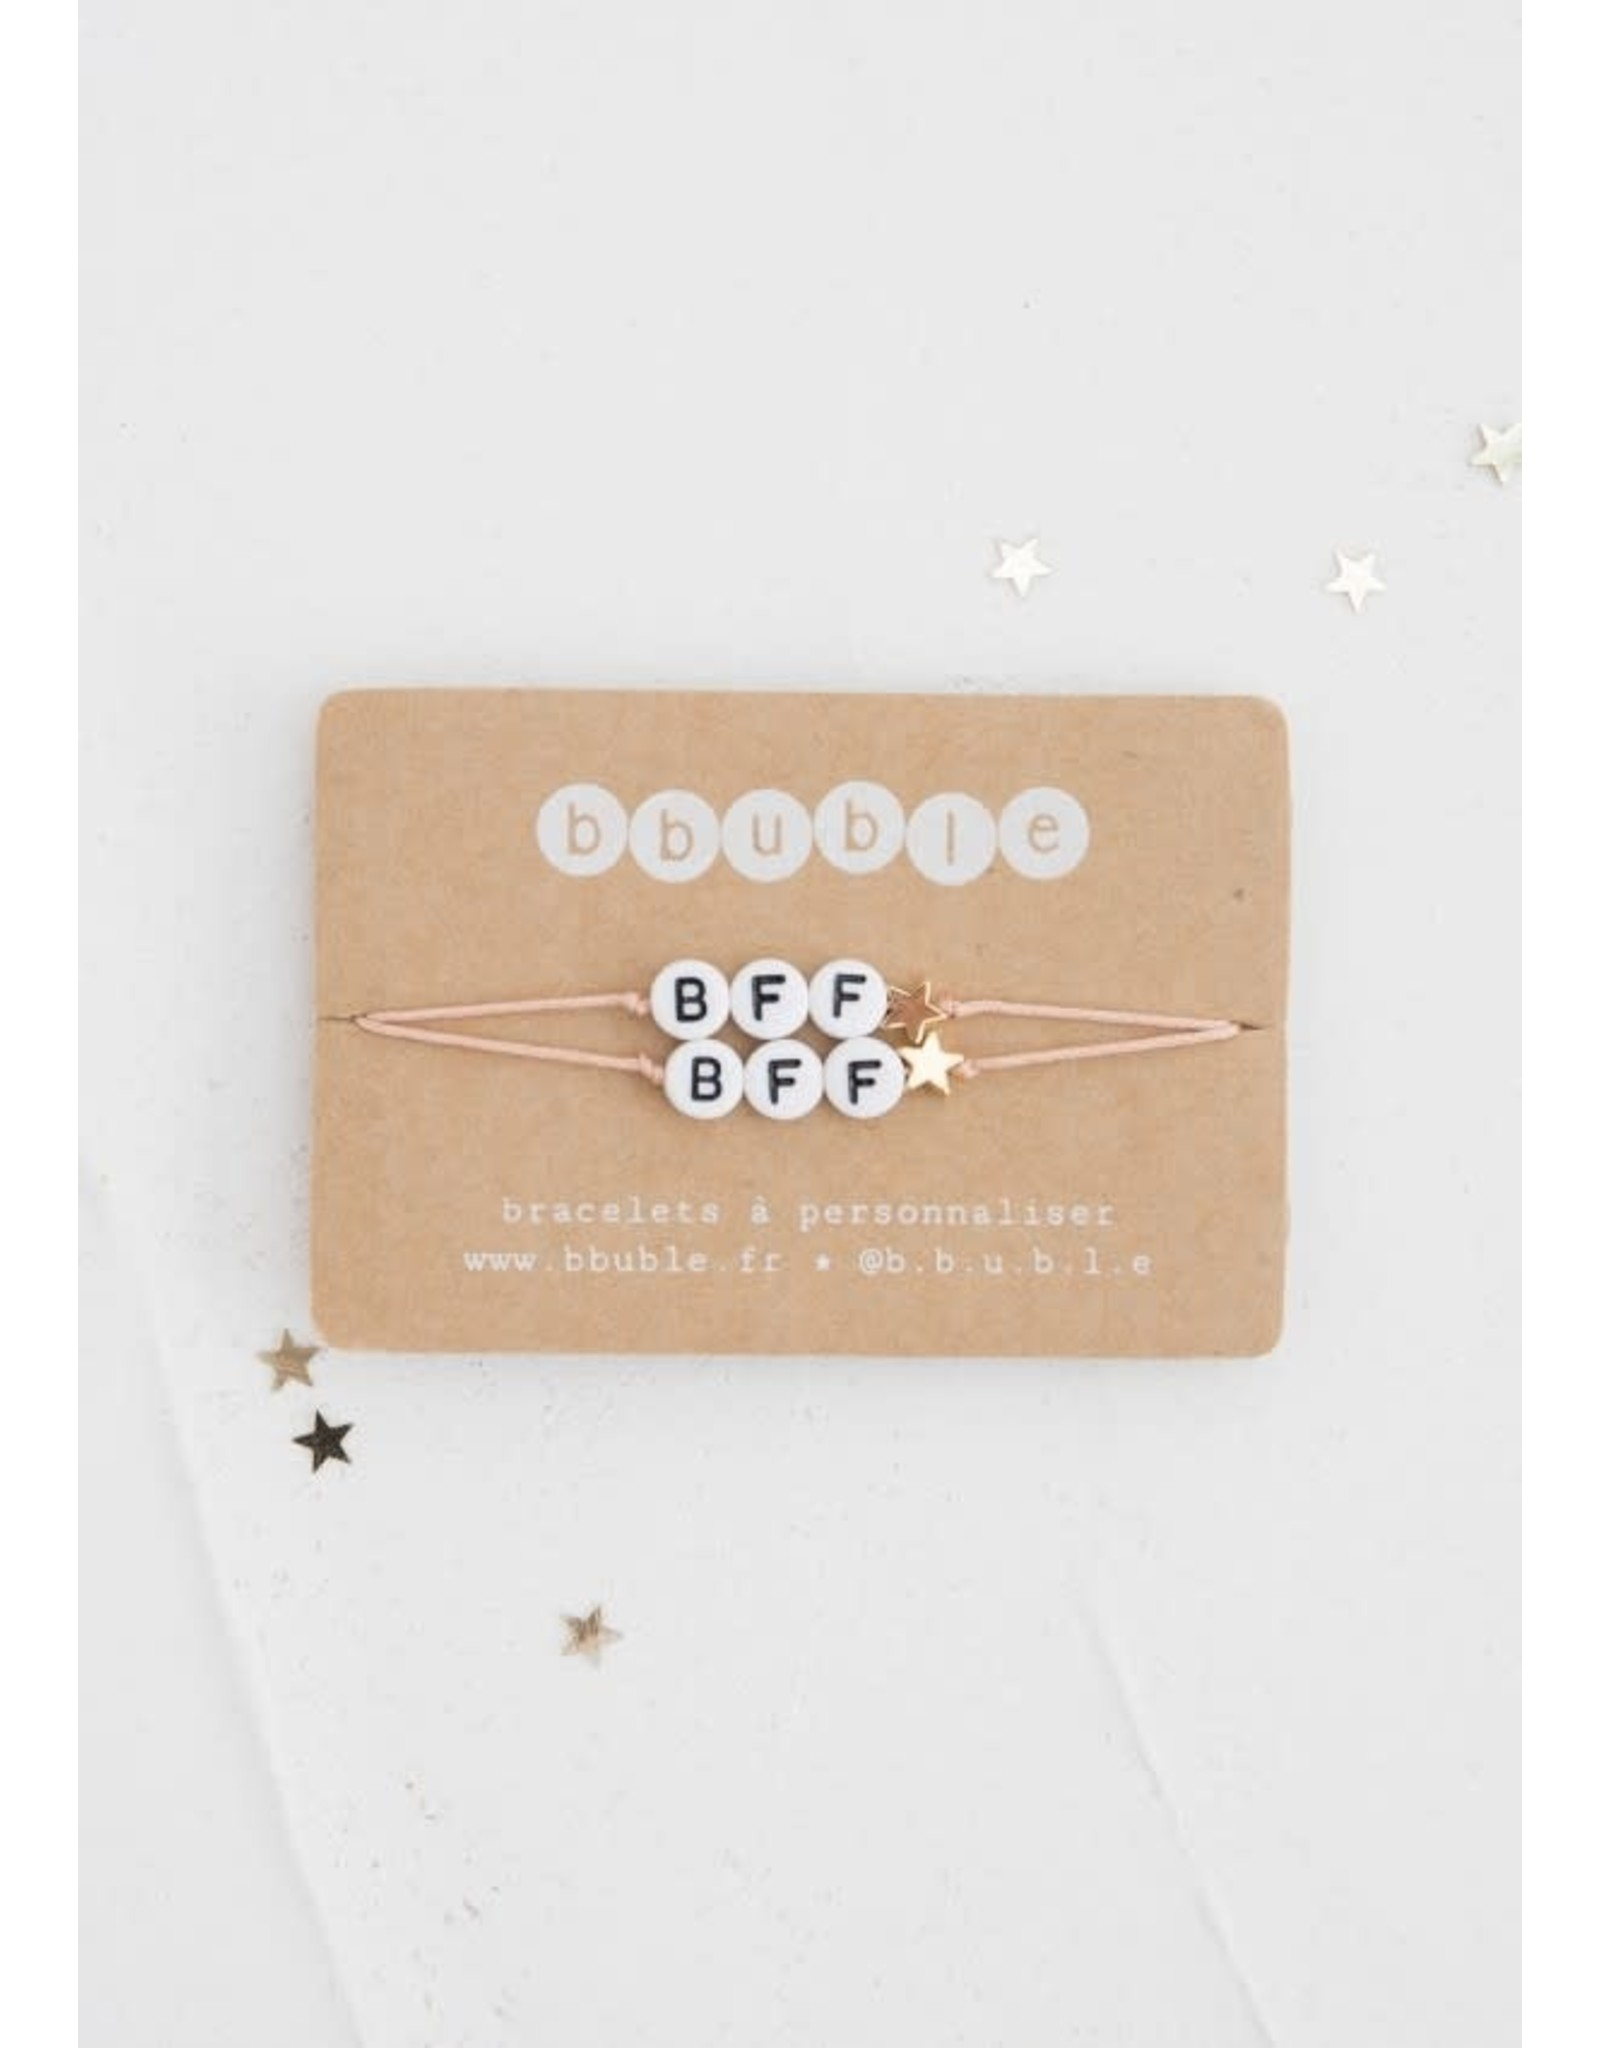 Bbubble Bracelet / blanc / BFF (etoile)